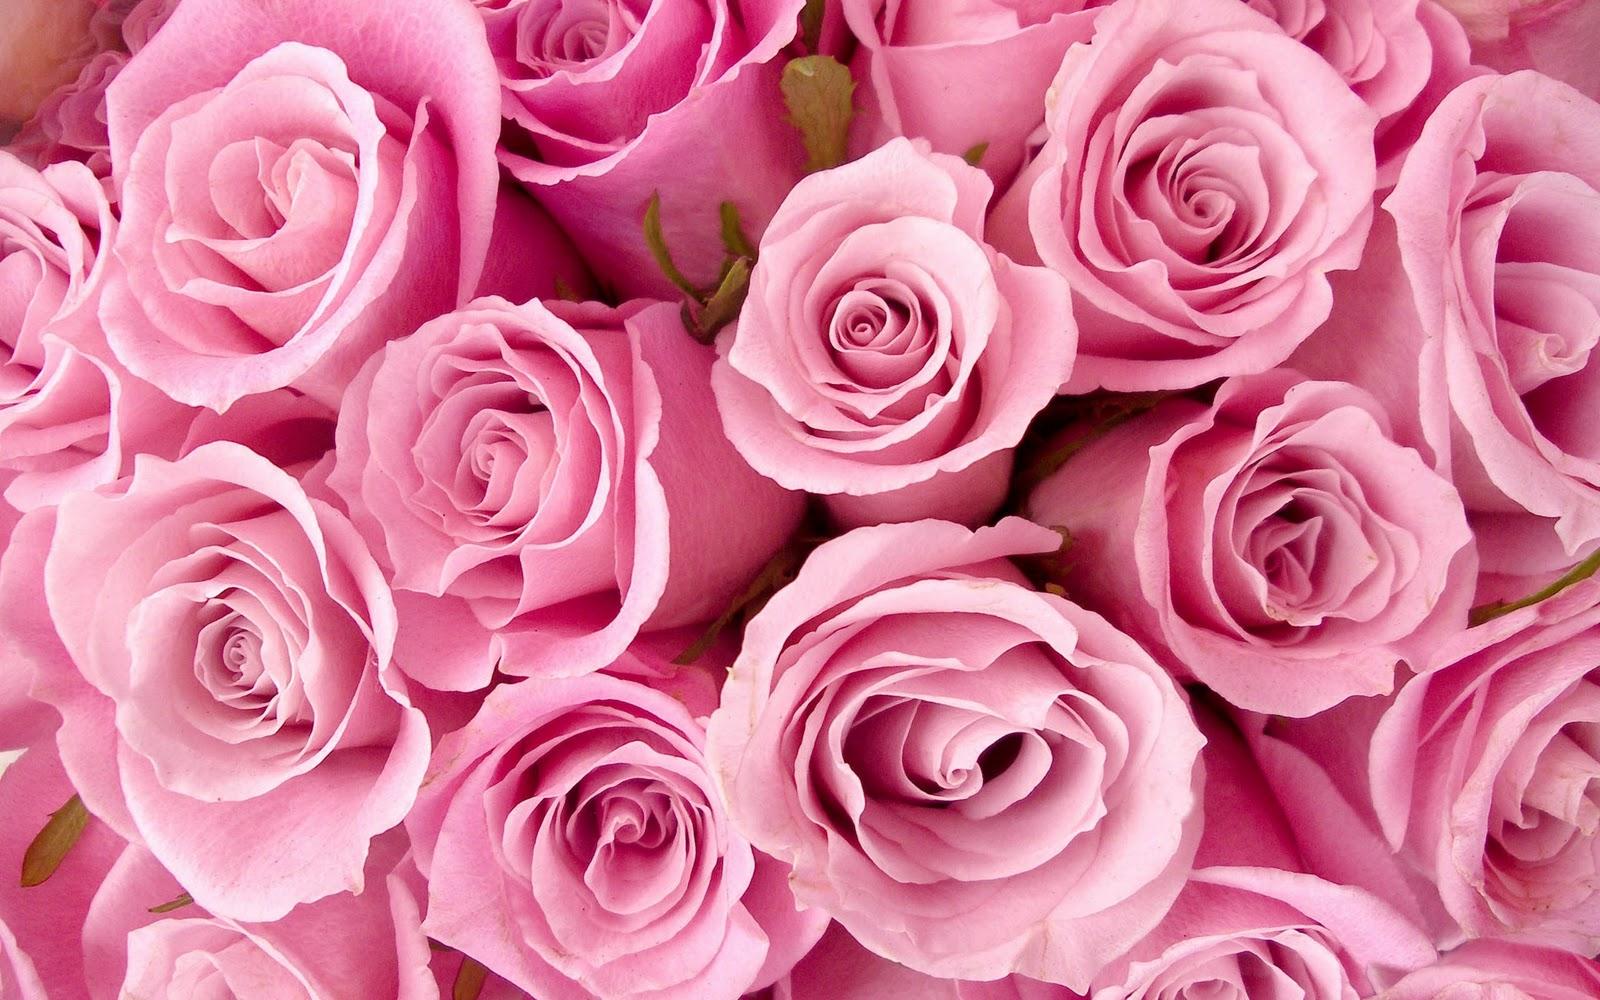 http://3.bp.blogspot.com/-wblleAUb1nE/UF2nxyE0bzI/AAAAAAAAAIE/_ZUw7fXk1Ec/s1600/pink-roses-wallpaper-hd.jpg